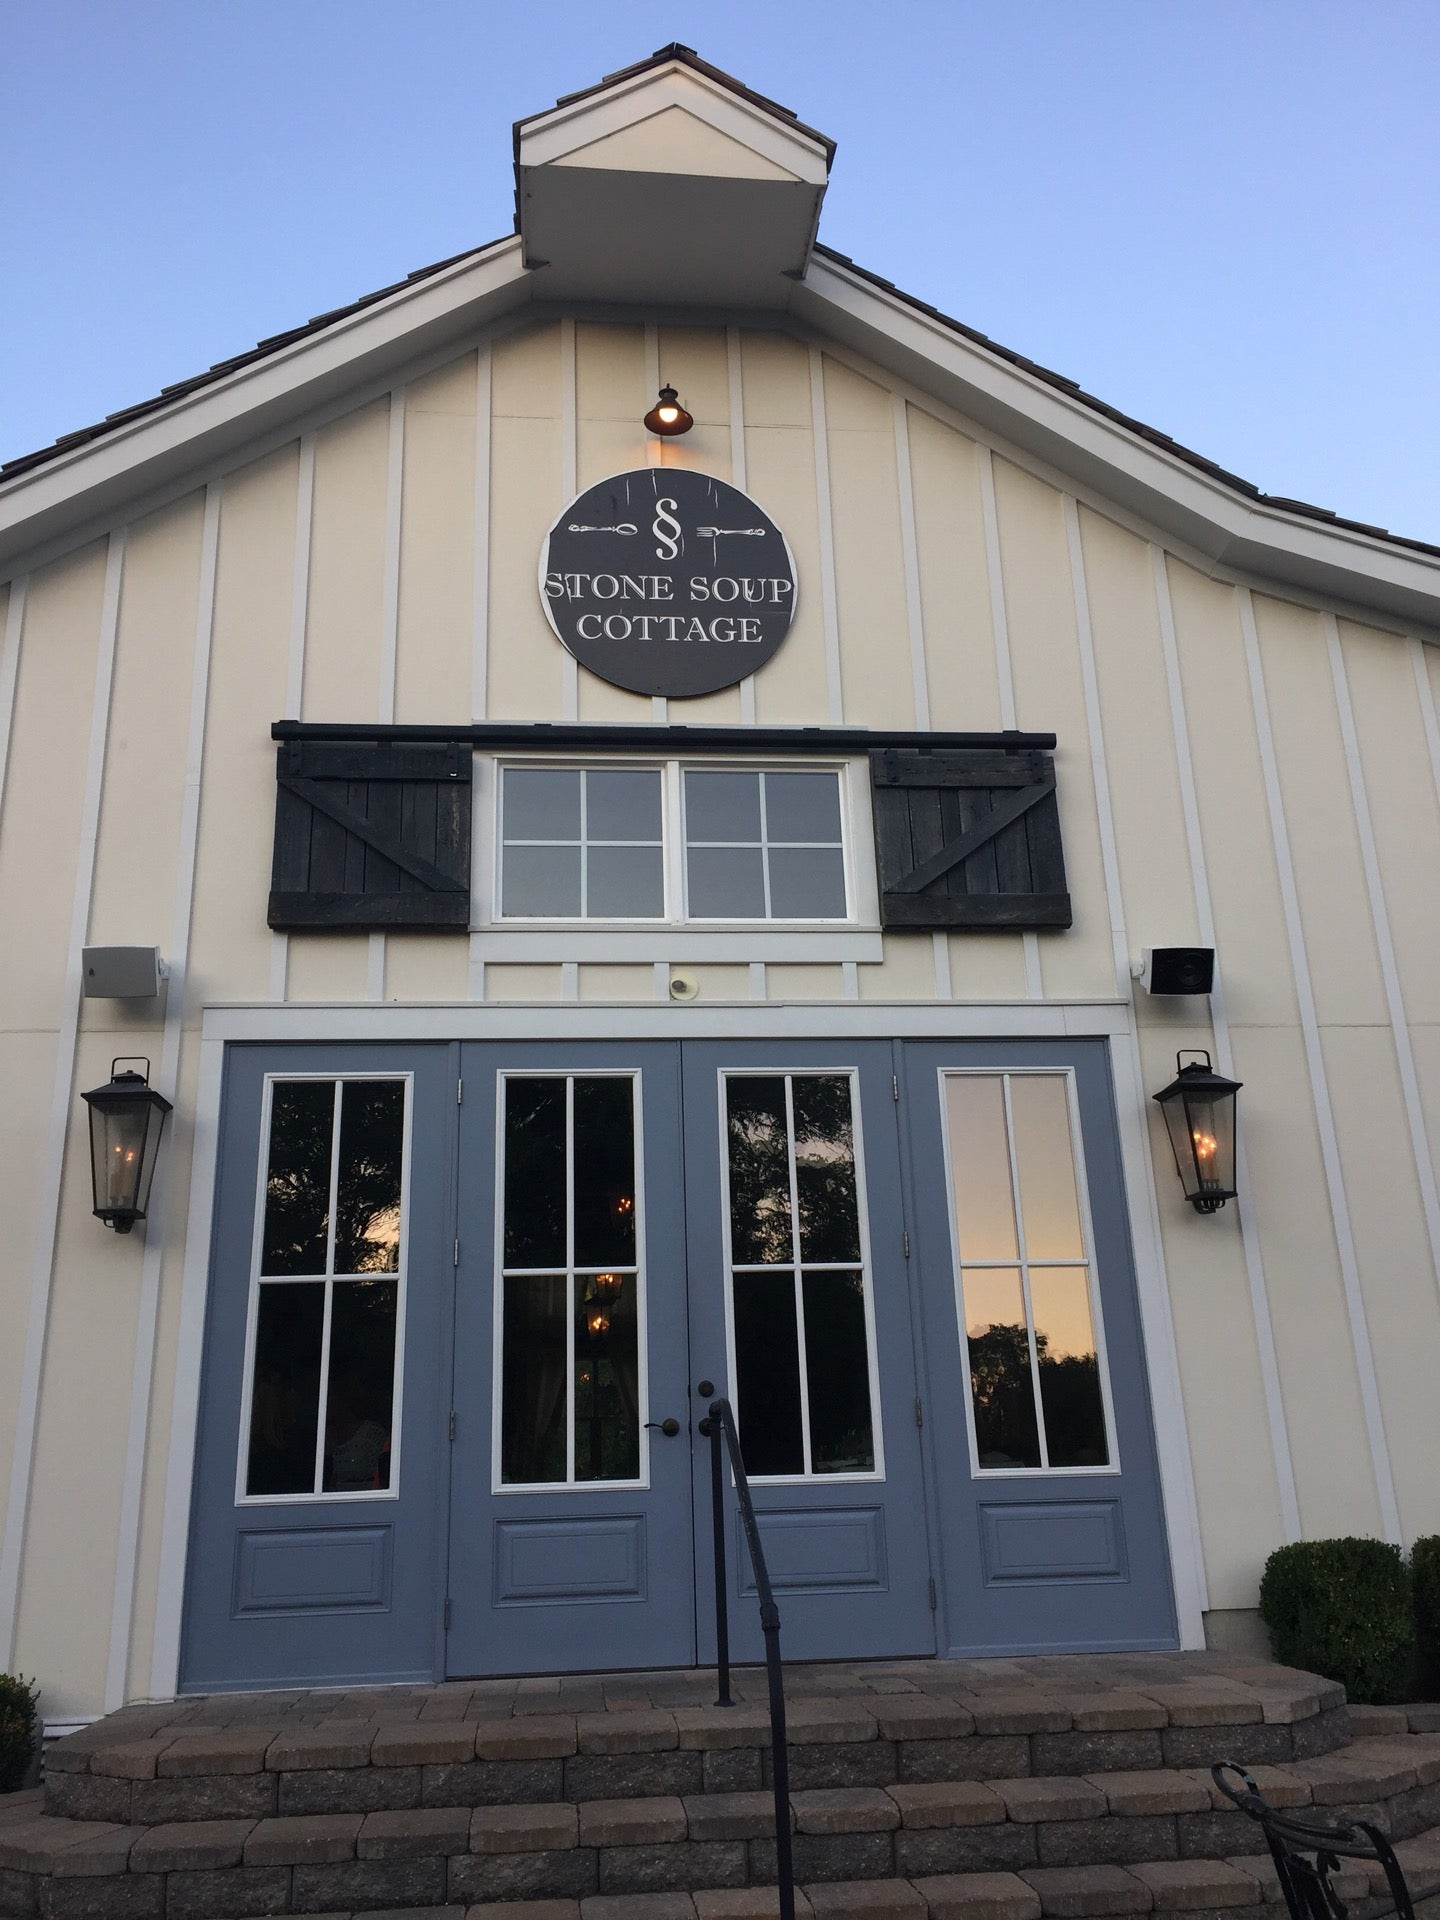 Stone Soup Cottage at Highway N Cottleville MO